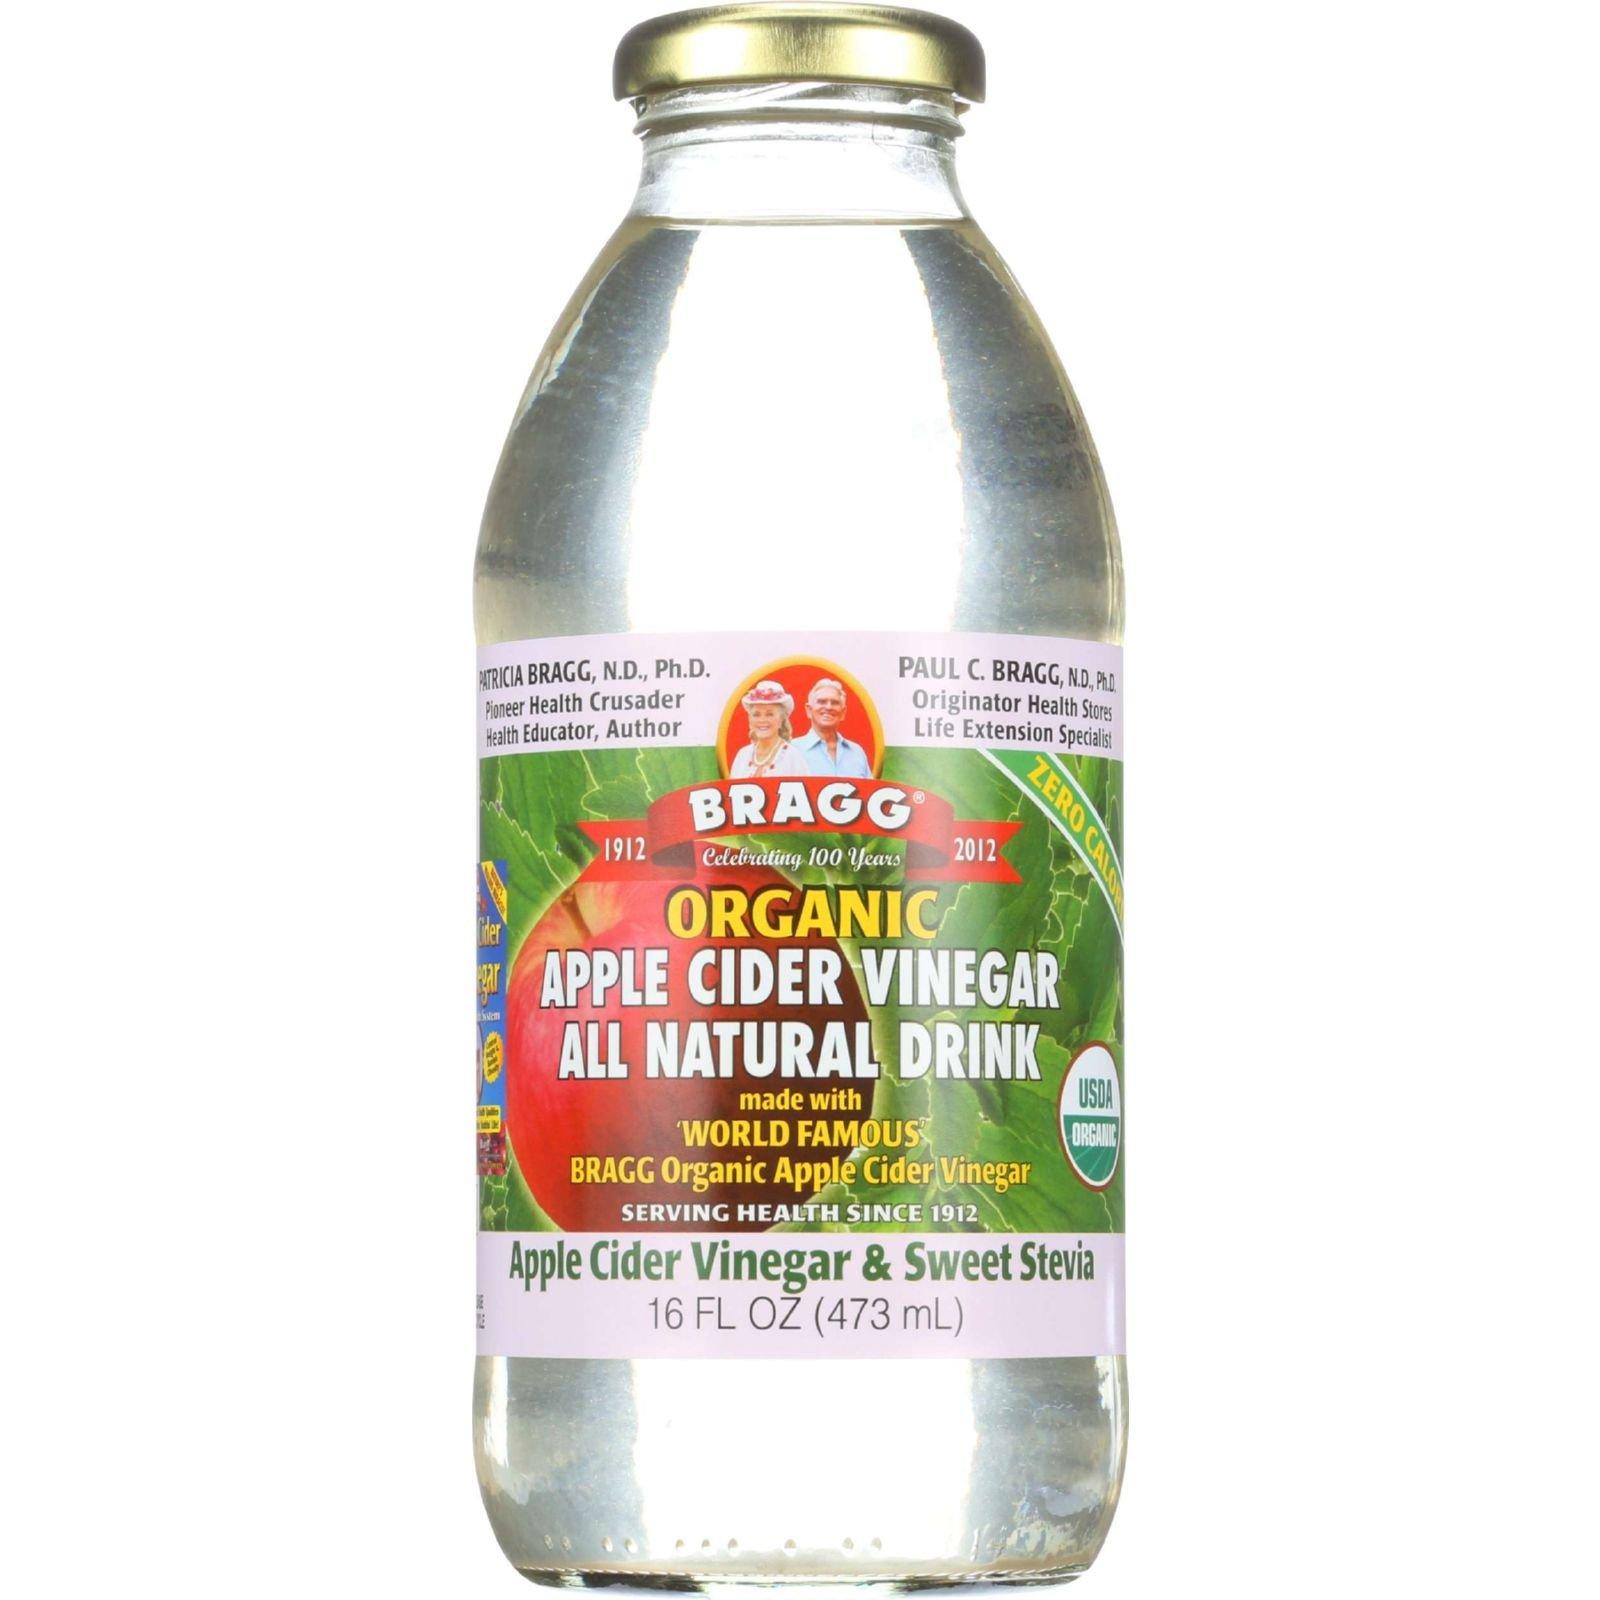 Bragg Apple Cider Vinegar Drink - Organic - Sweet Stevia - 16 oz - case of 12 - 95%+ Organic - - - - -